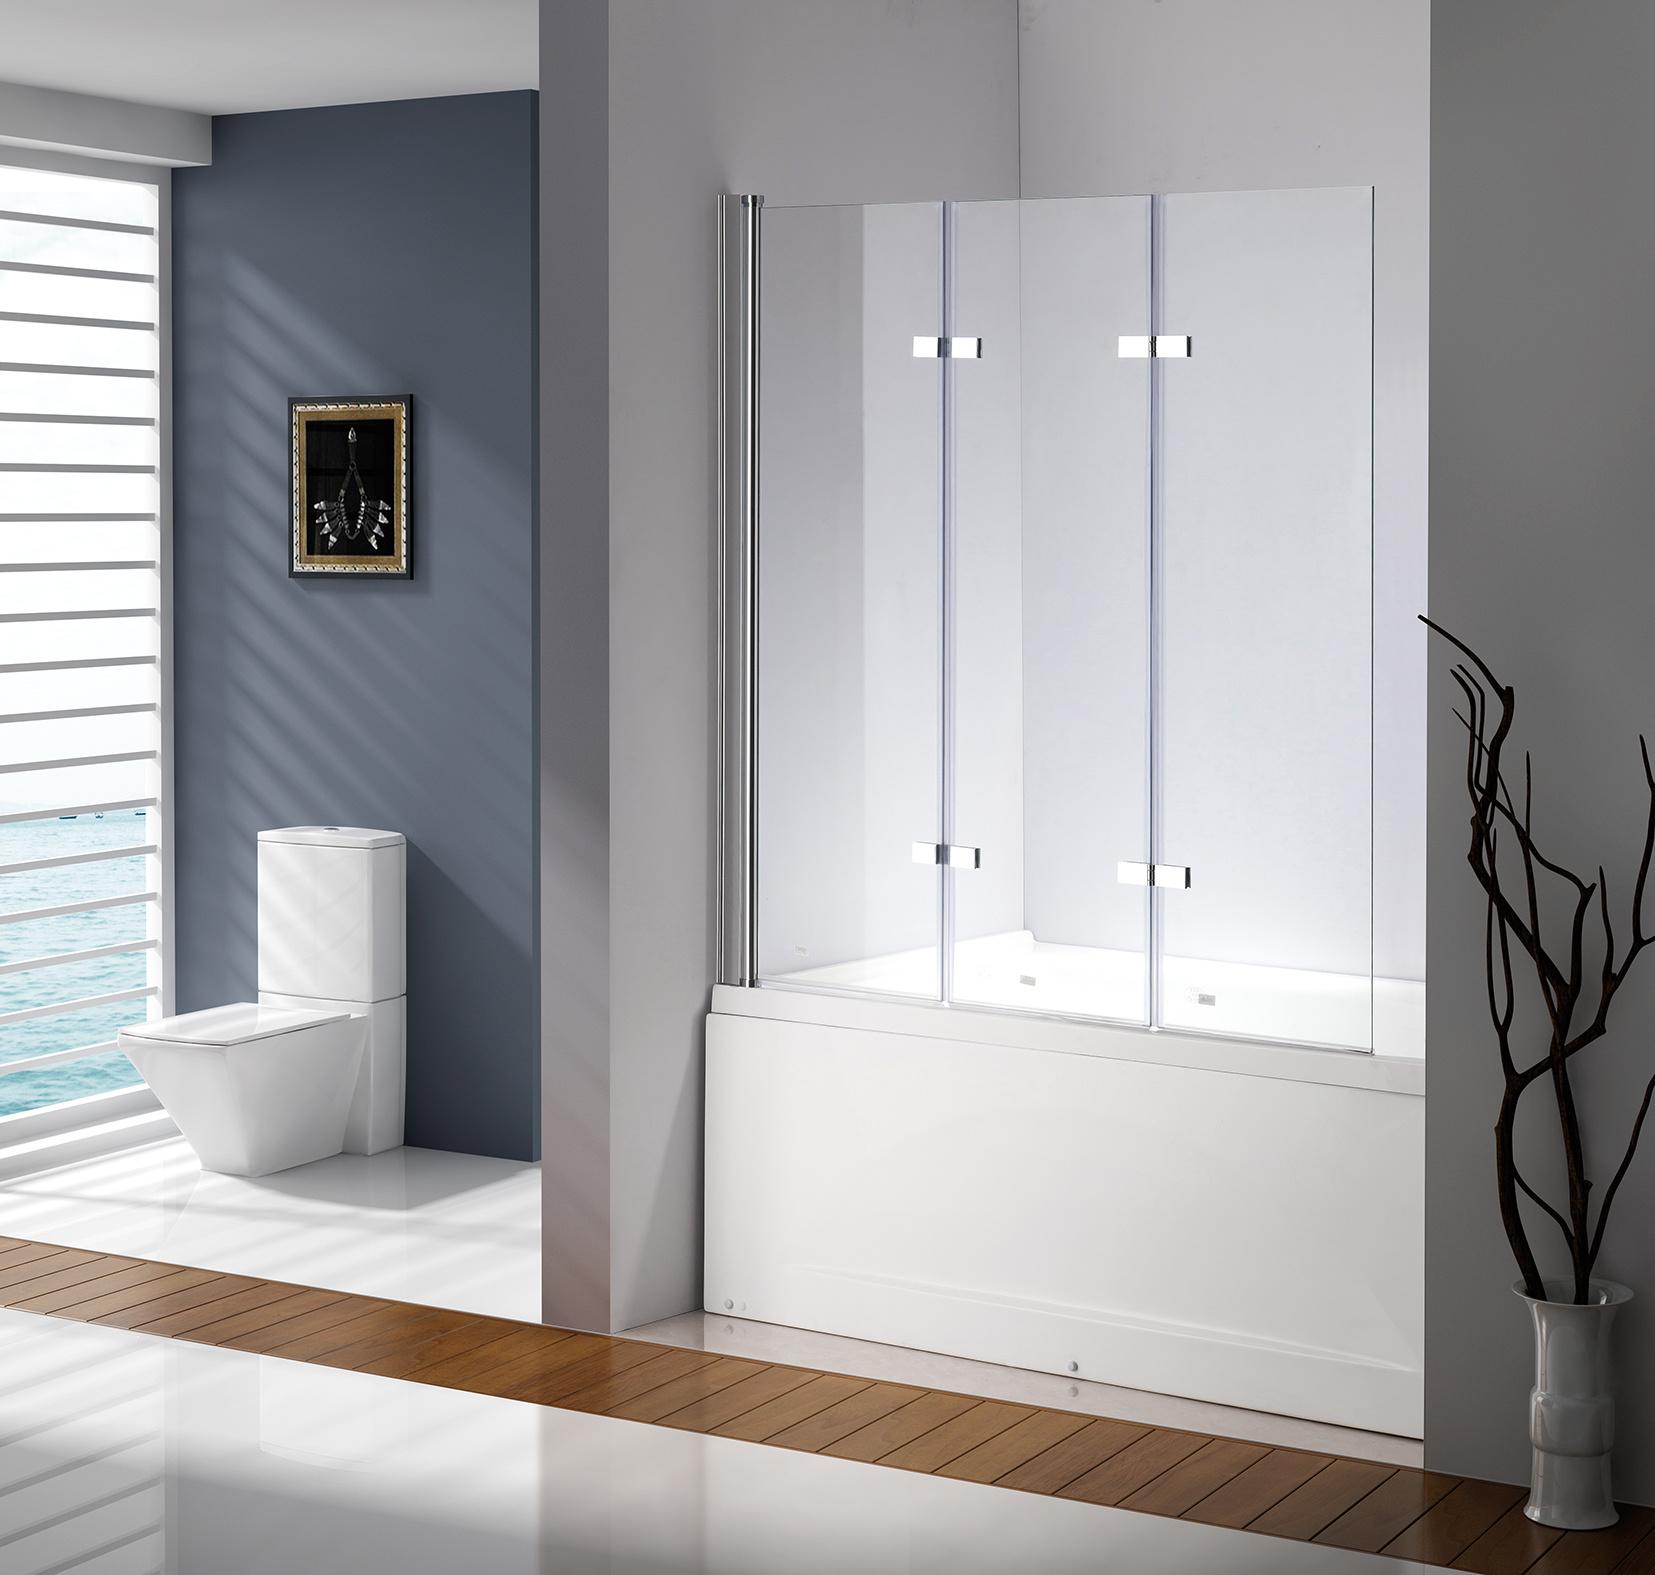 3 Fold Chrome Folding Bath Shower Screen Door Panel 1300mm x 1400mm  Z2728